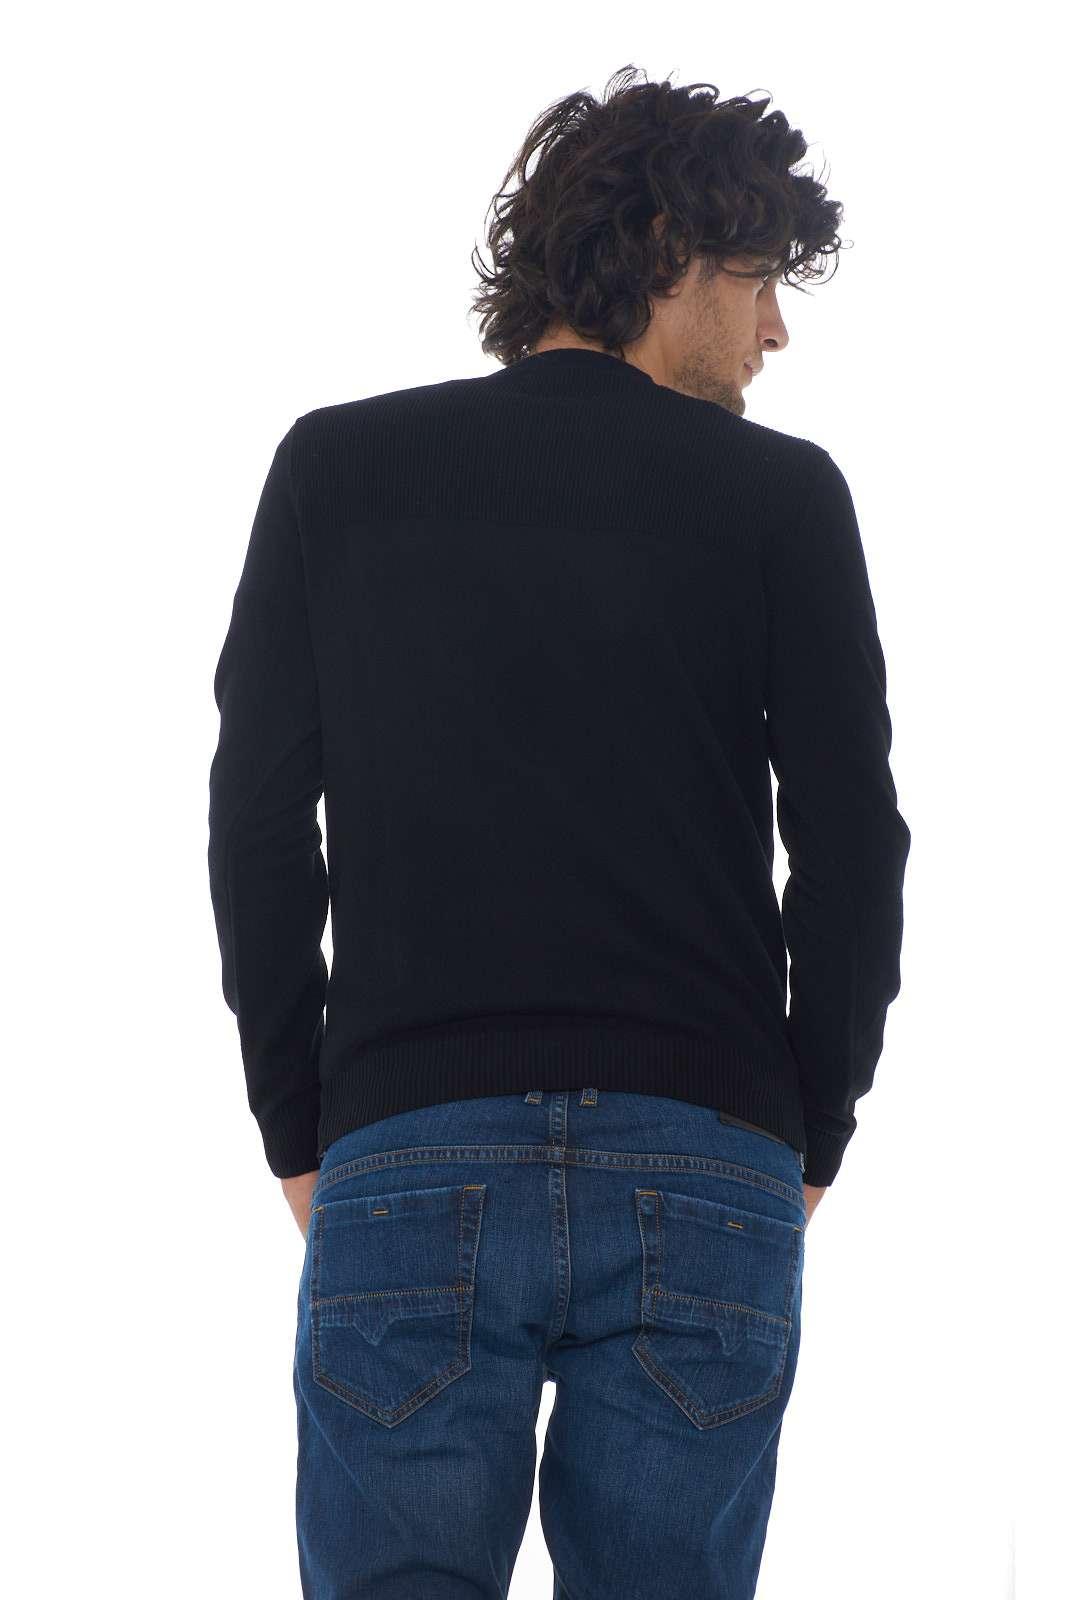 https://www.parmax.com/media/catalog/product/a/i/AI-outlet_parmax-maglia-uomo-Stone-Island-7115591A1-C.jpg